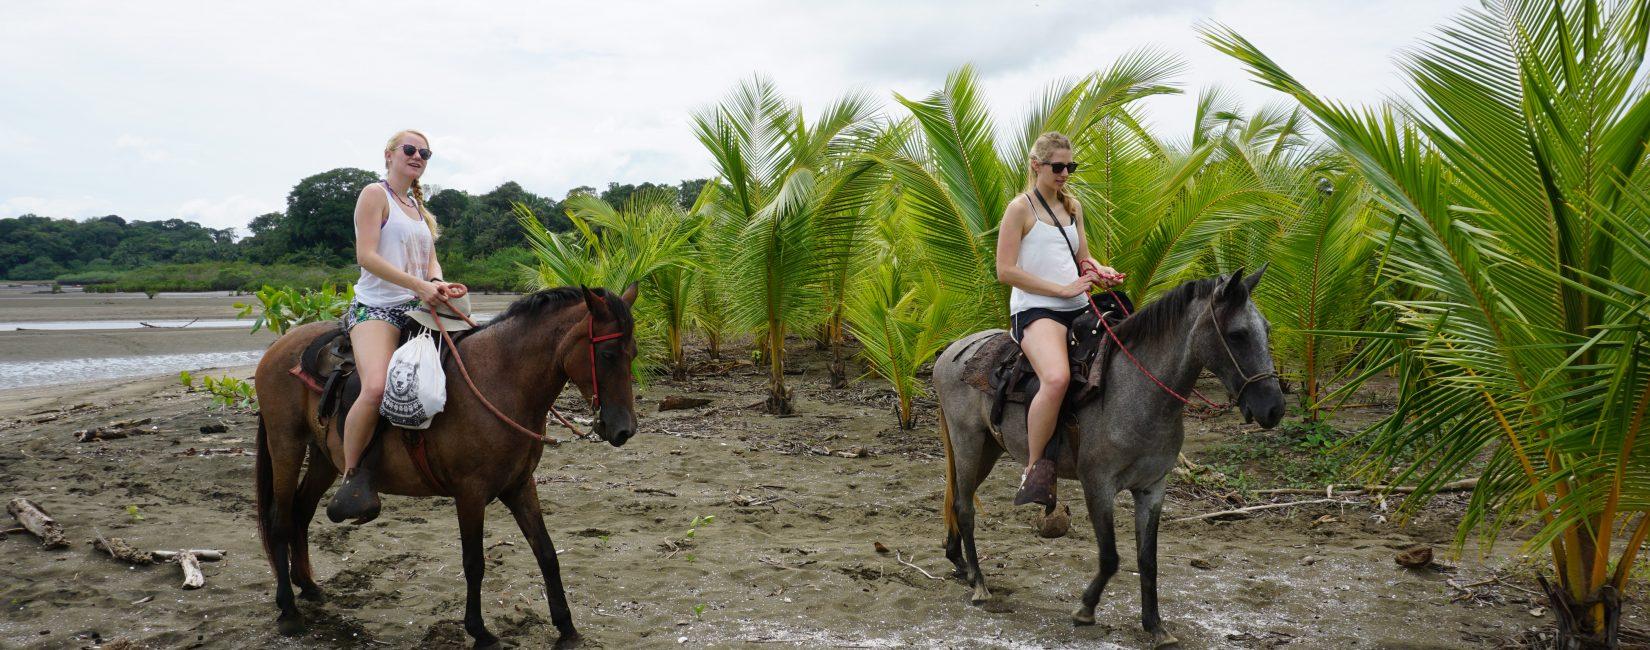 Horseback Rides